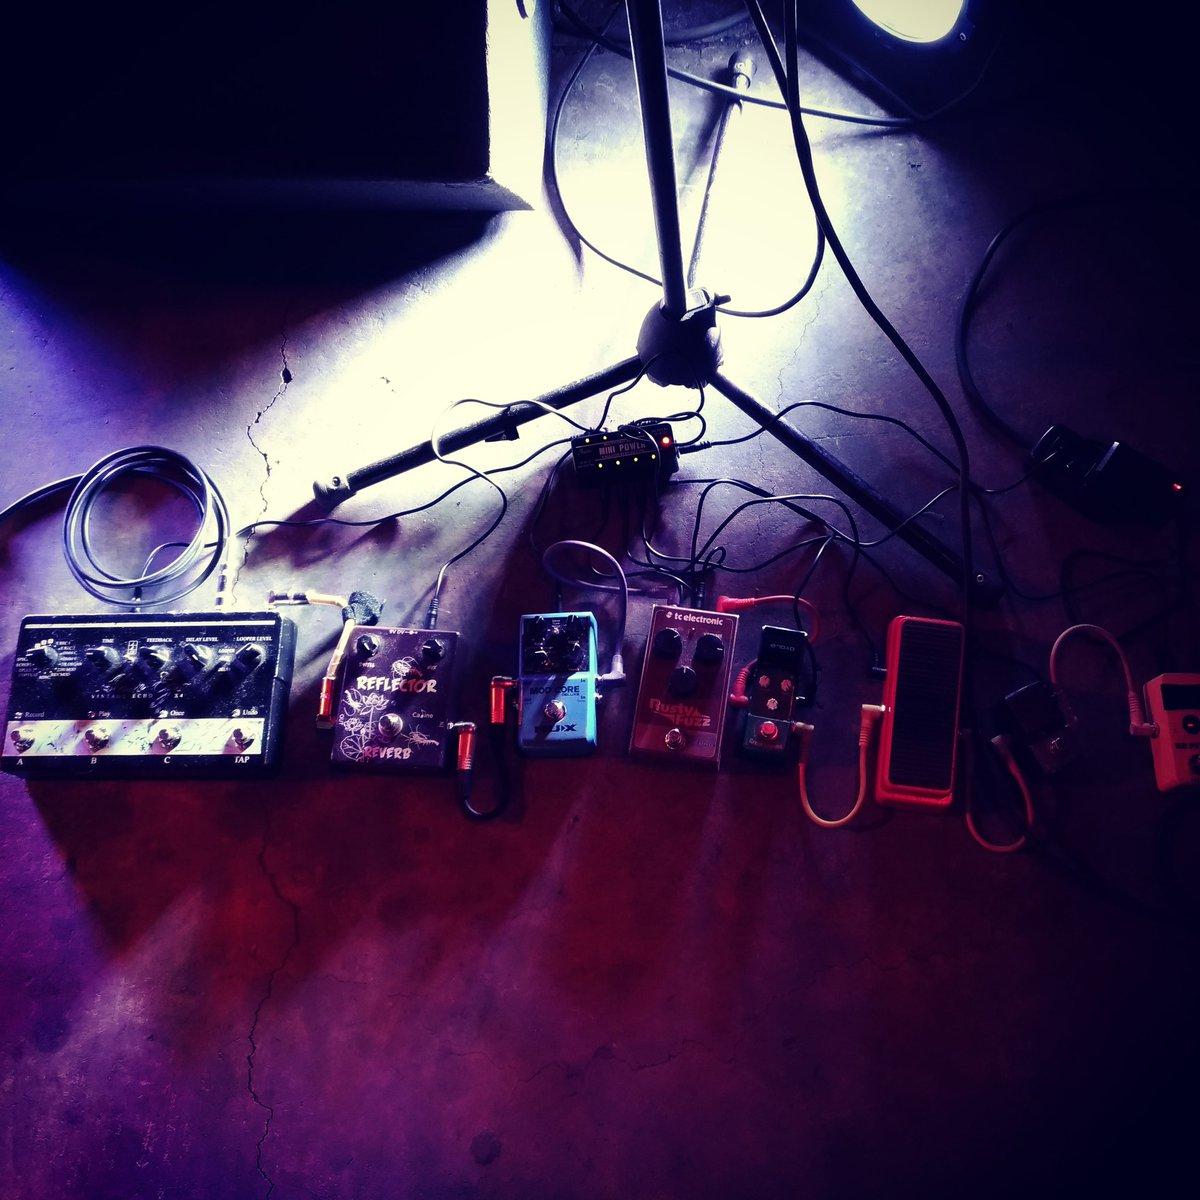 Gear 🔥🔥🔥🔥  #acidalicemx #acidalice #heavypsych #stonerrock #stoner #blues #guitar #guitargear #fuzz https://t.co/uIQfTFpULi